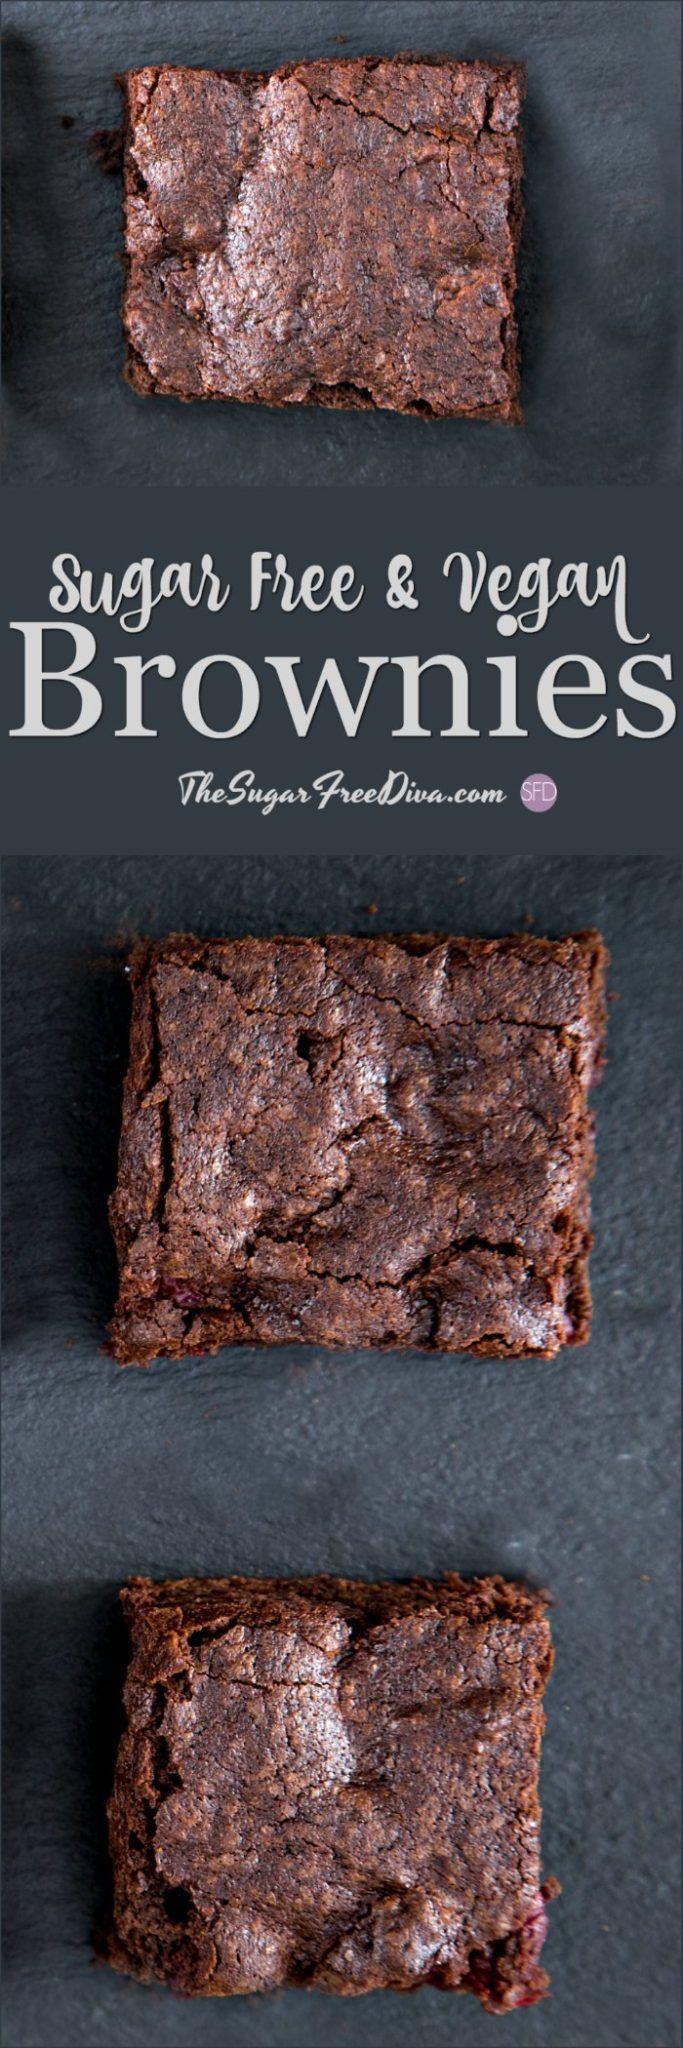 Sugar Free and Vegan Brownies #vegan #sugarfree #keto #chocolate #diabetic #recipe #brownies #tasty #trending #yummy